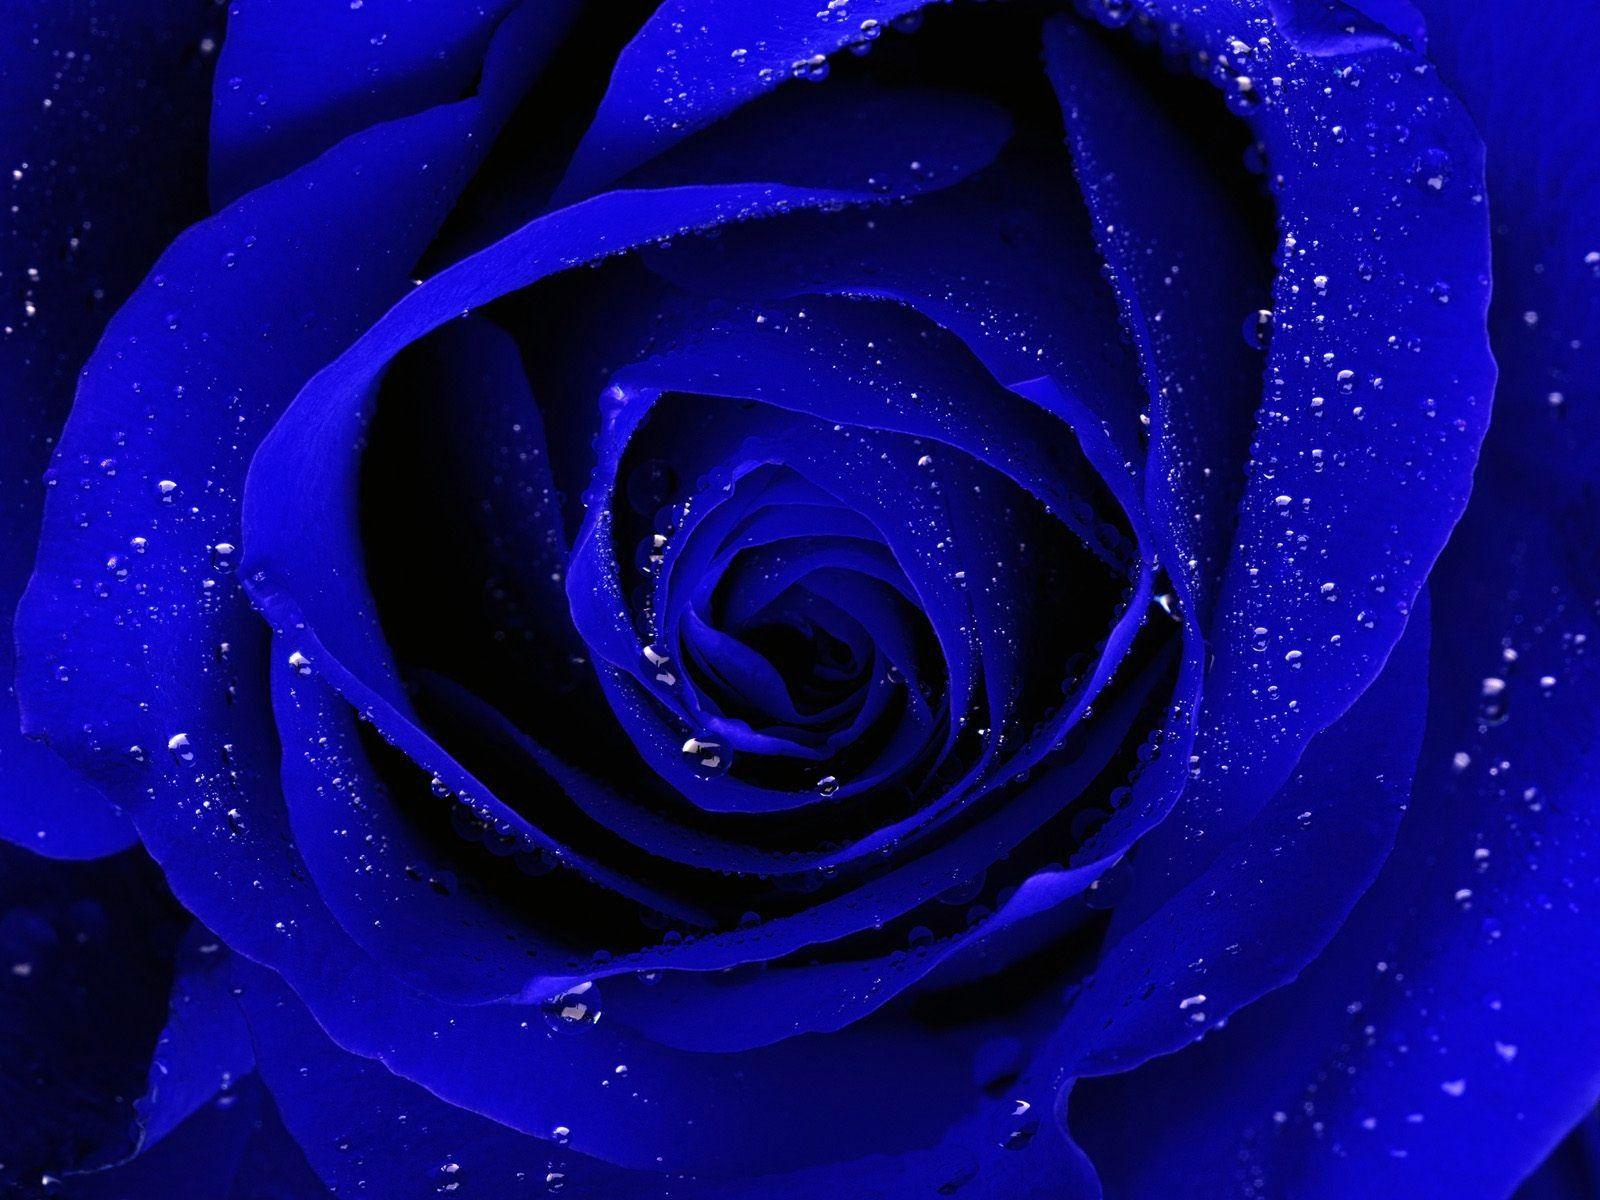 rose flower wallpaper hd wallpapers 1920x1080px ~ dark purple